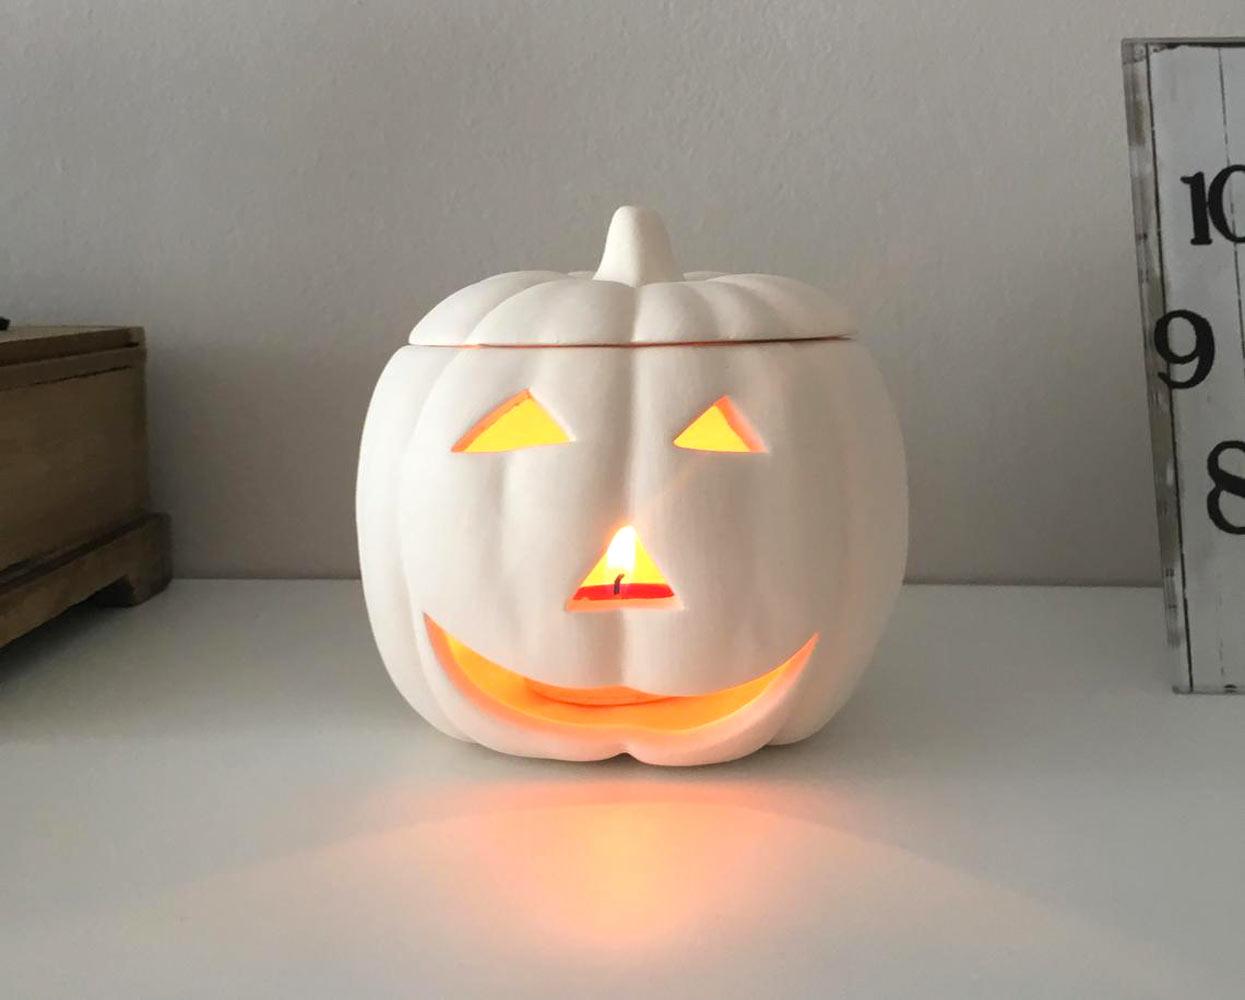 Zucca bianca lanterna fai da te per illuminare casa ad Halloween.